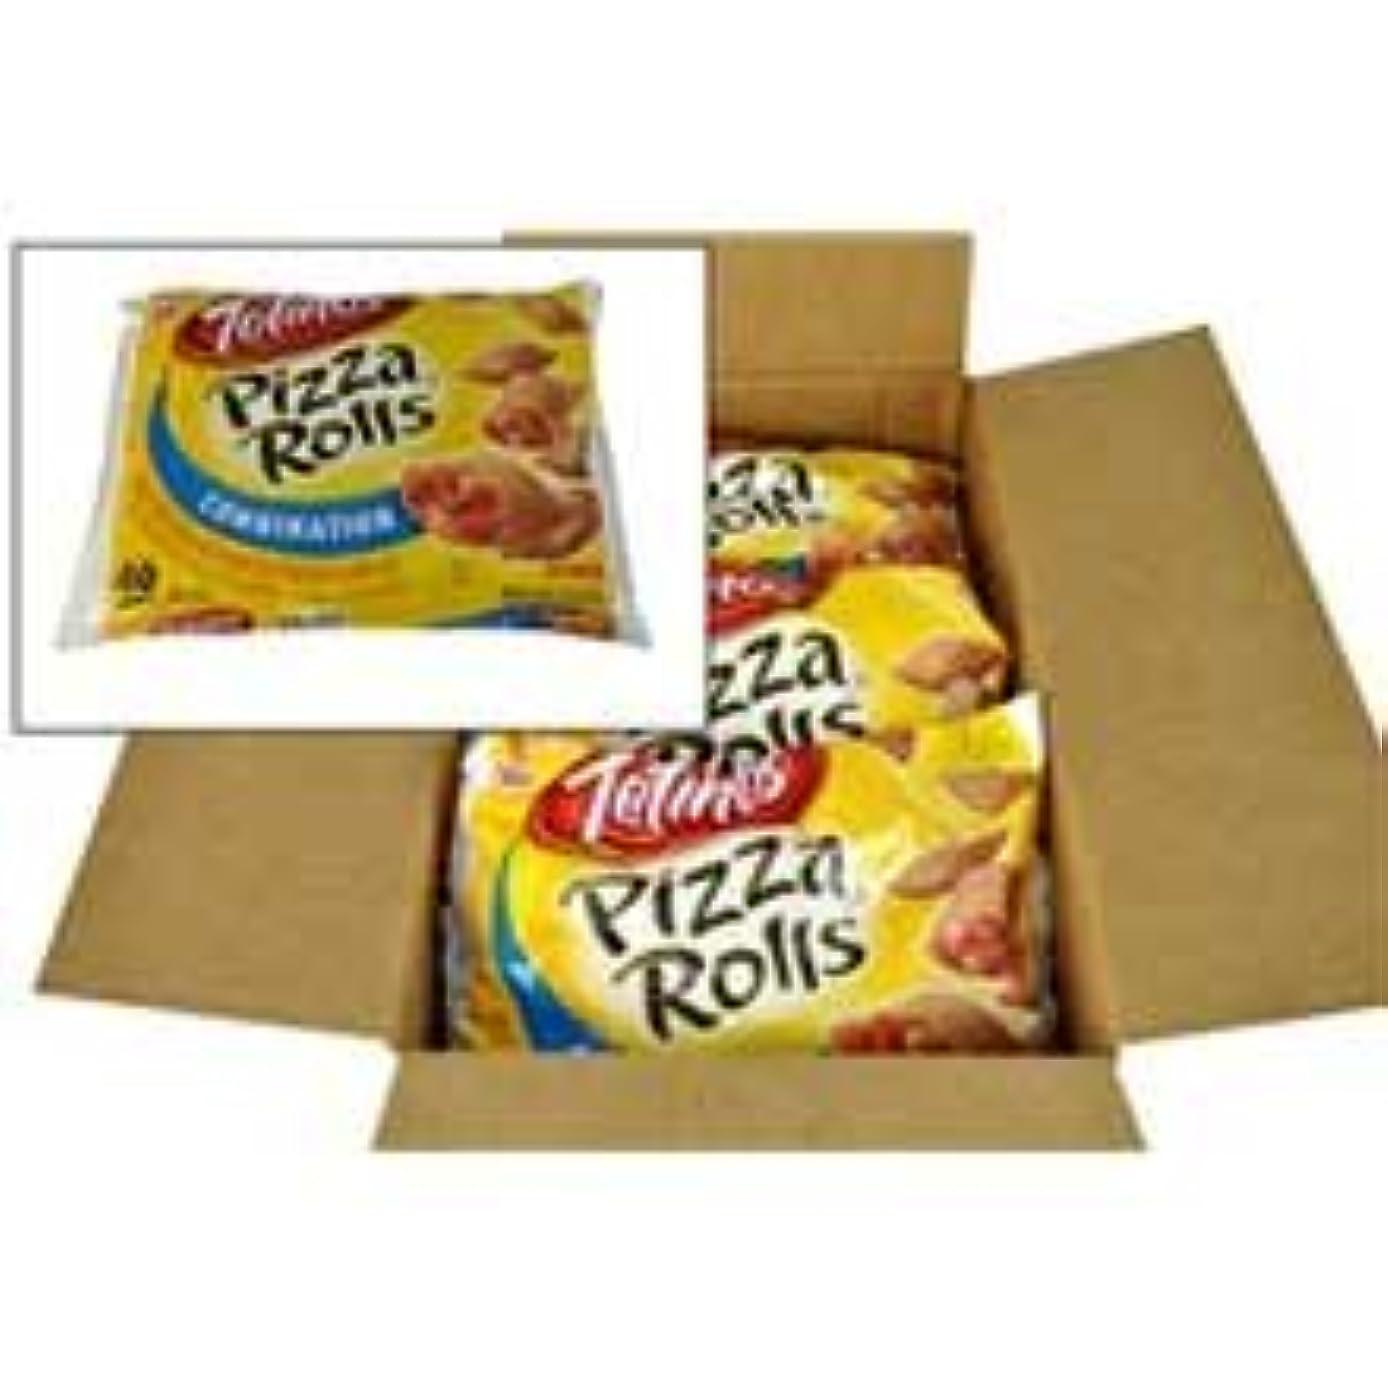 Totinos Combination Pizza Roll, 19.8 Ounce - 9 per case.